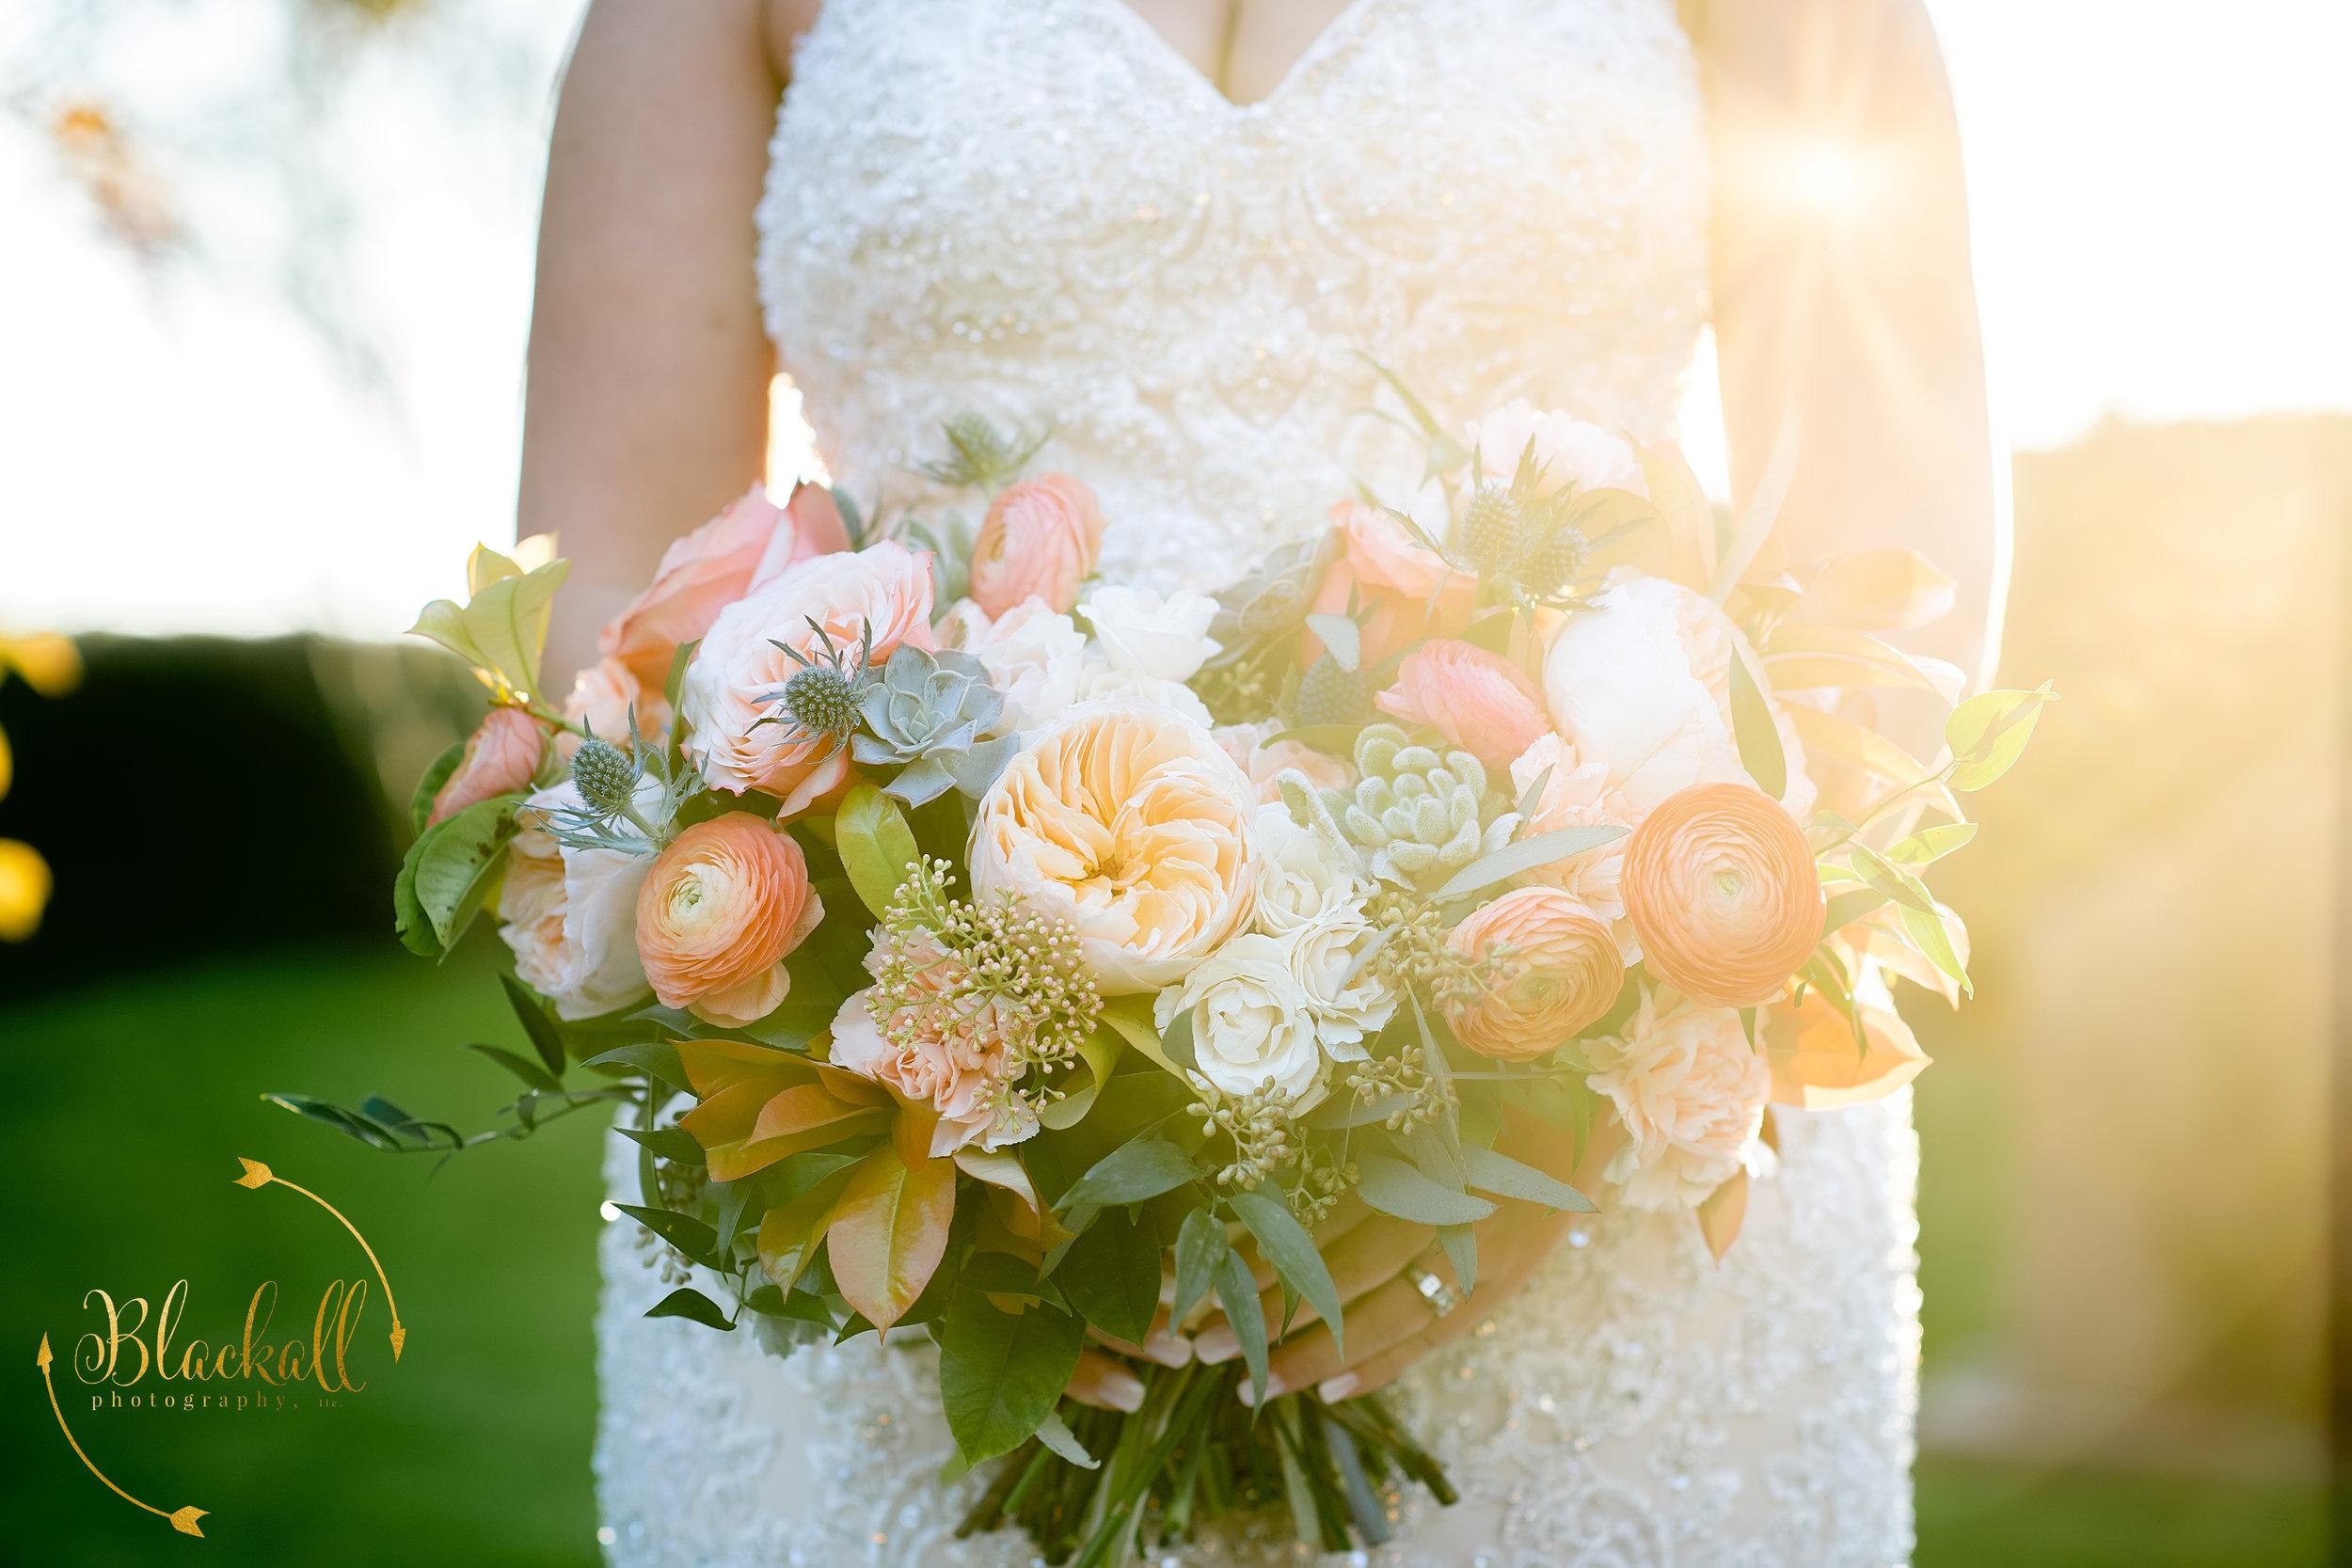 Stunning floral design by Katie bug Florals